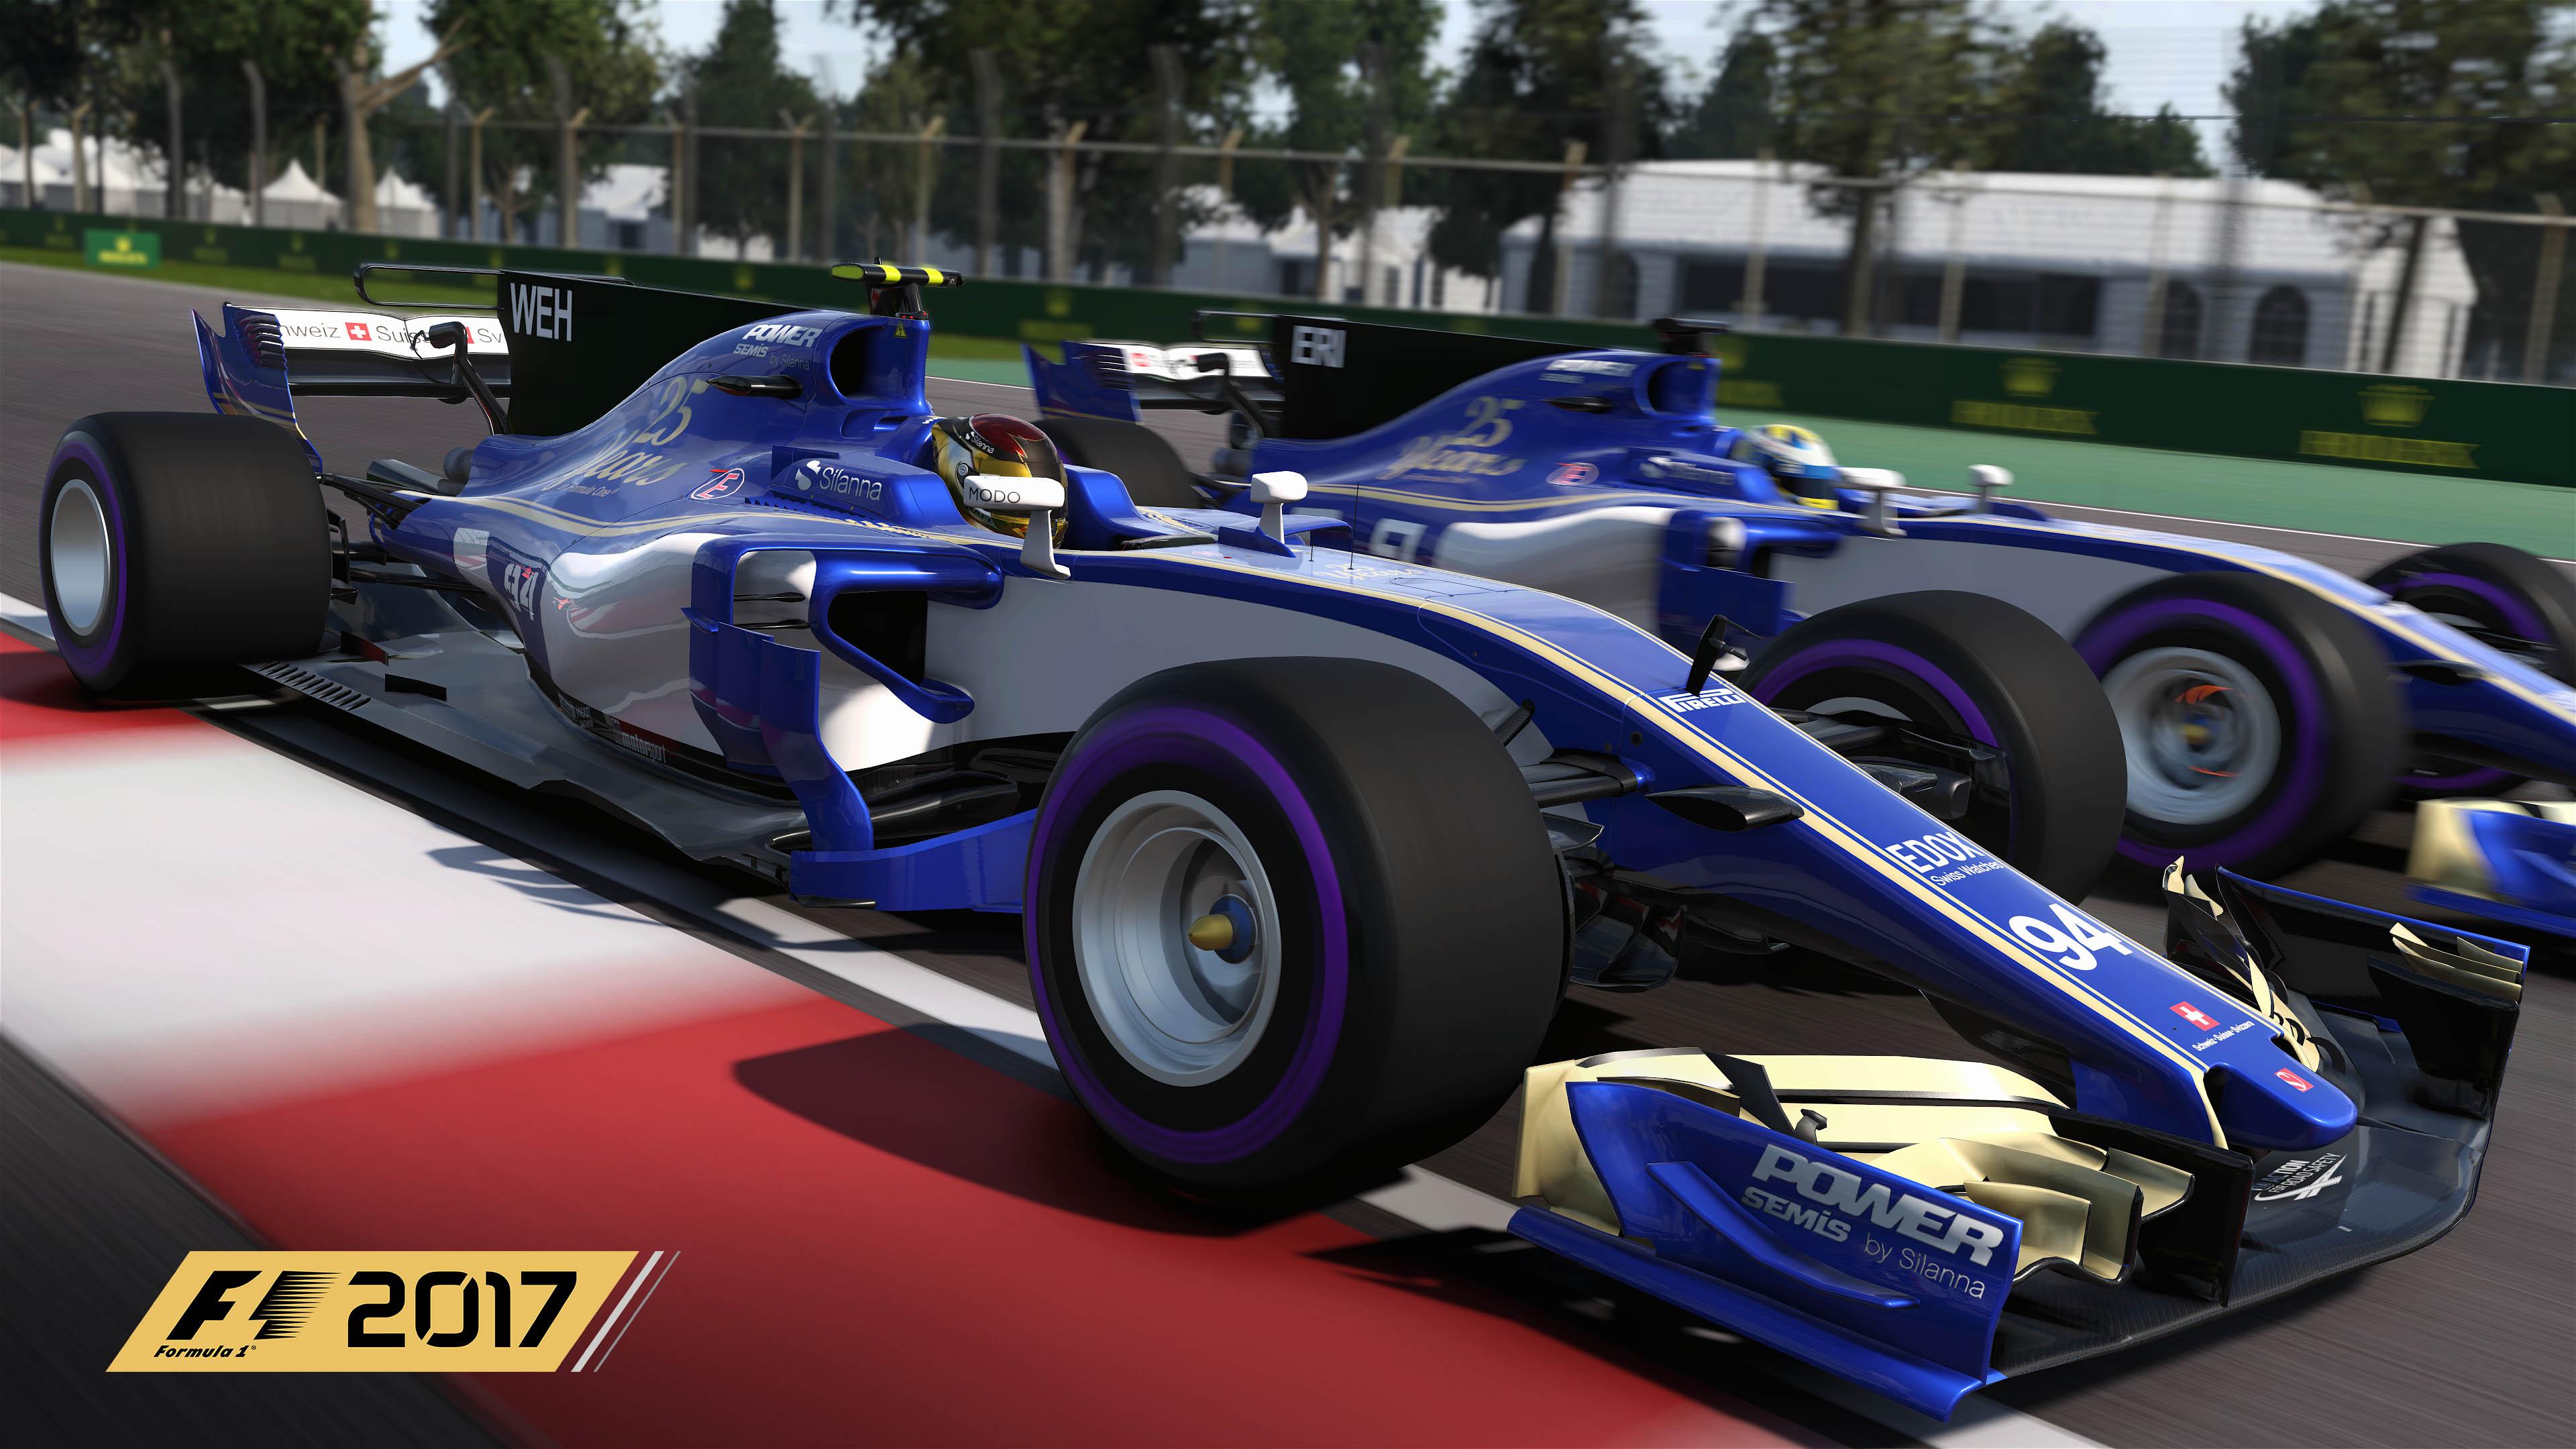 F1 2017 new liveries 9